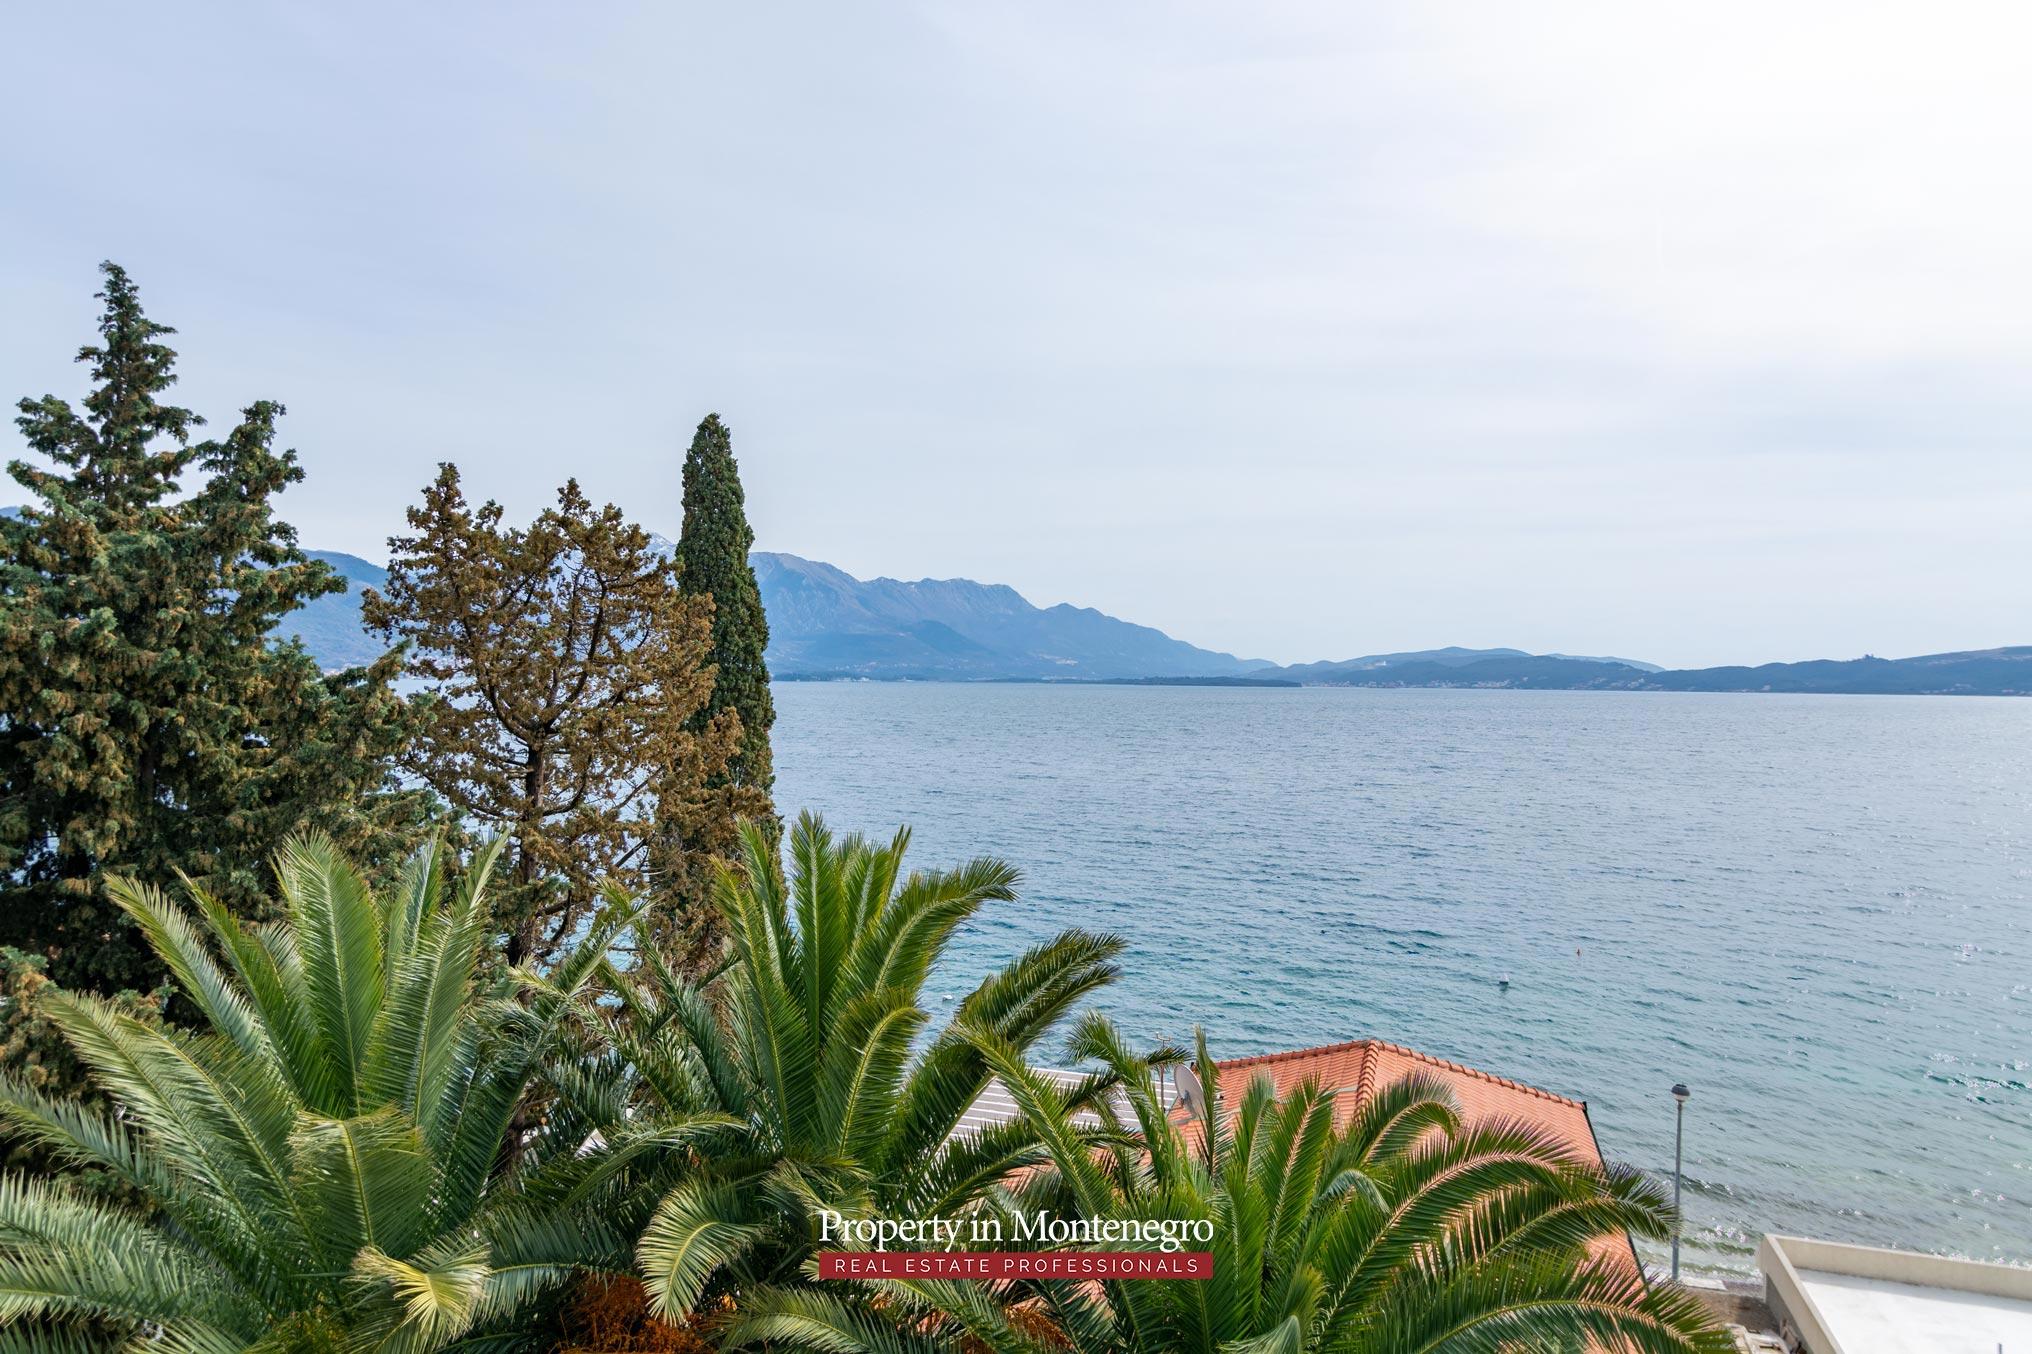 Luxury-waterfront-villa-for-sale-in-Montenegro (27).jpg